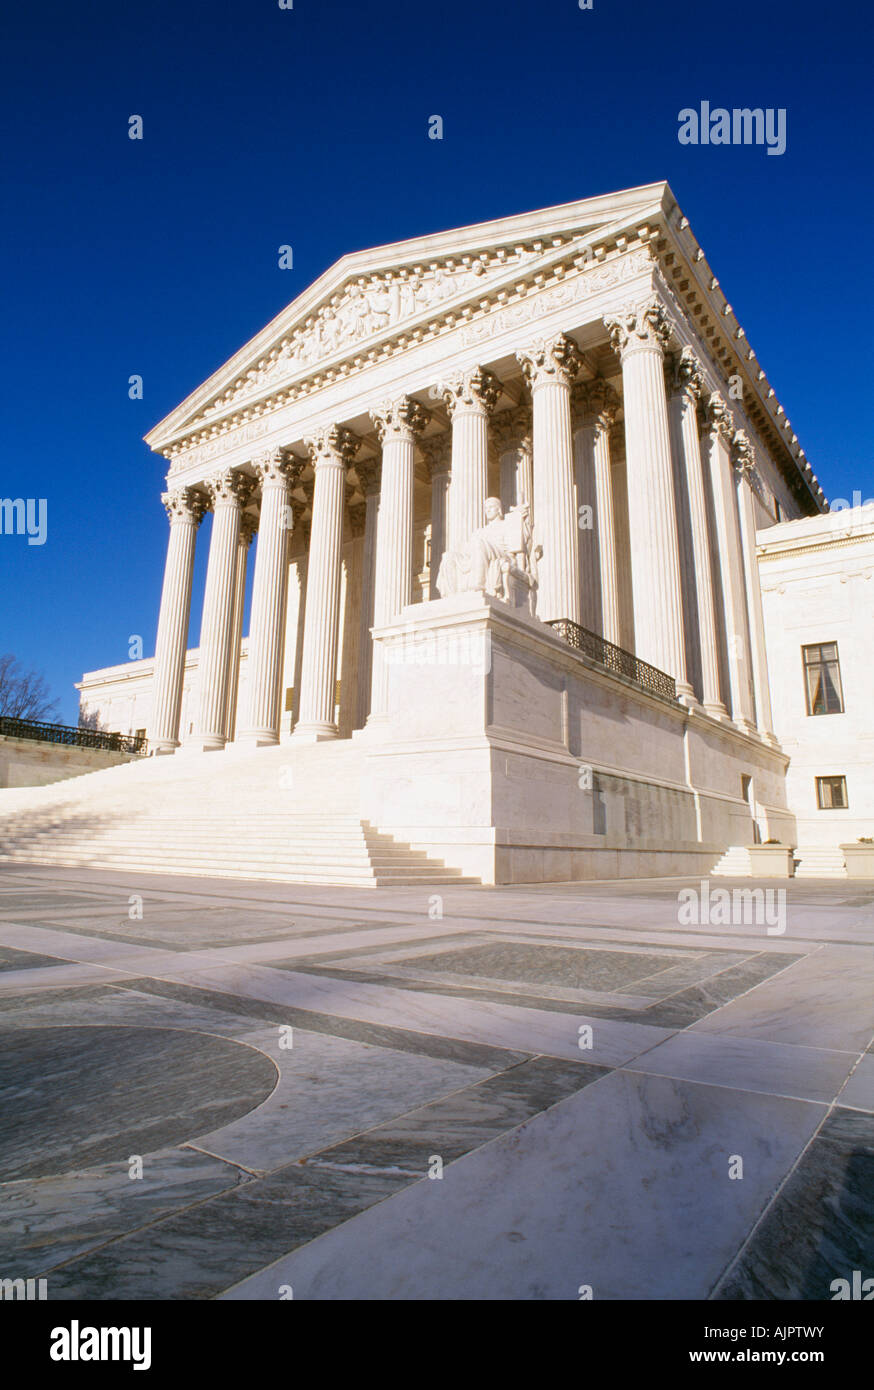 The U.S. Supreme Court Building in Washington, DC - Stock Image